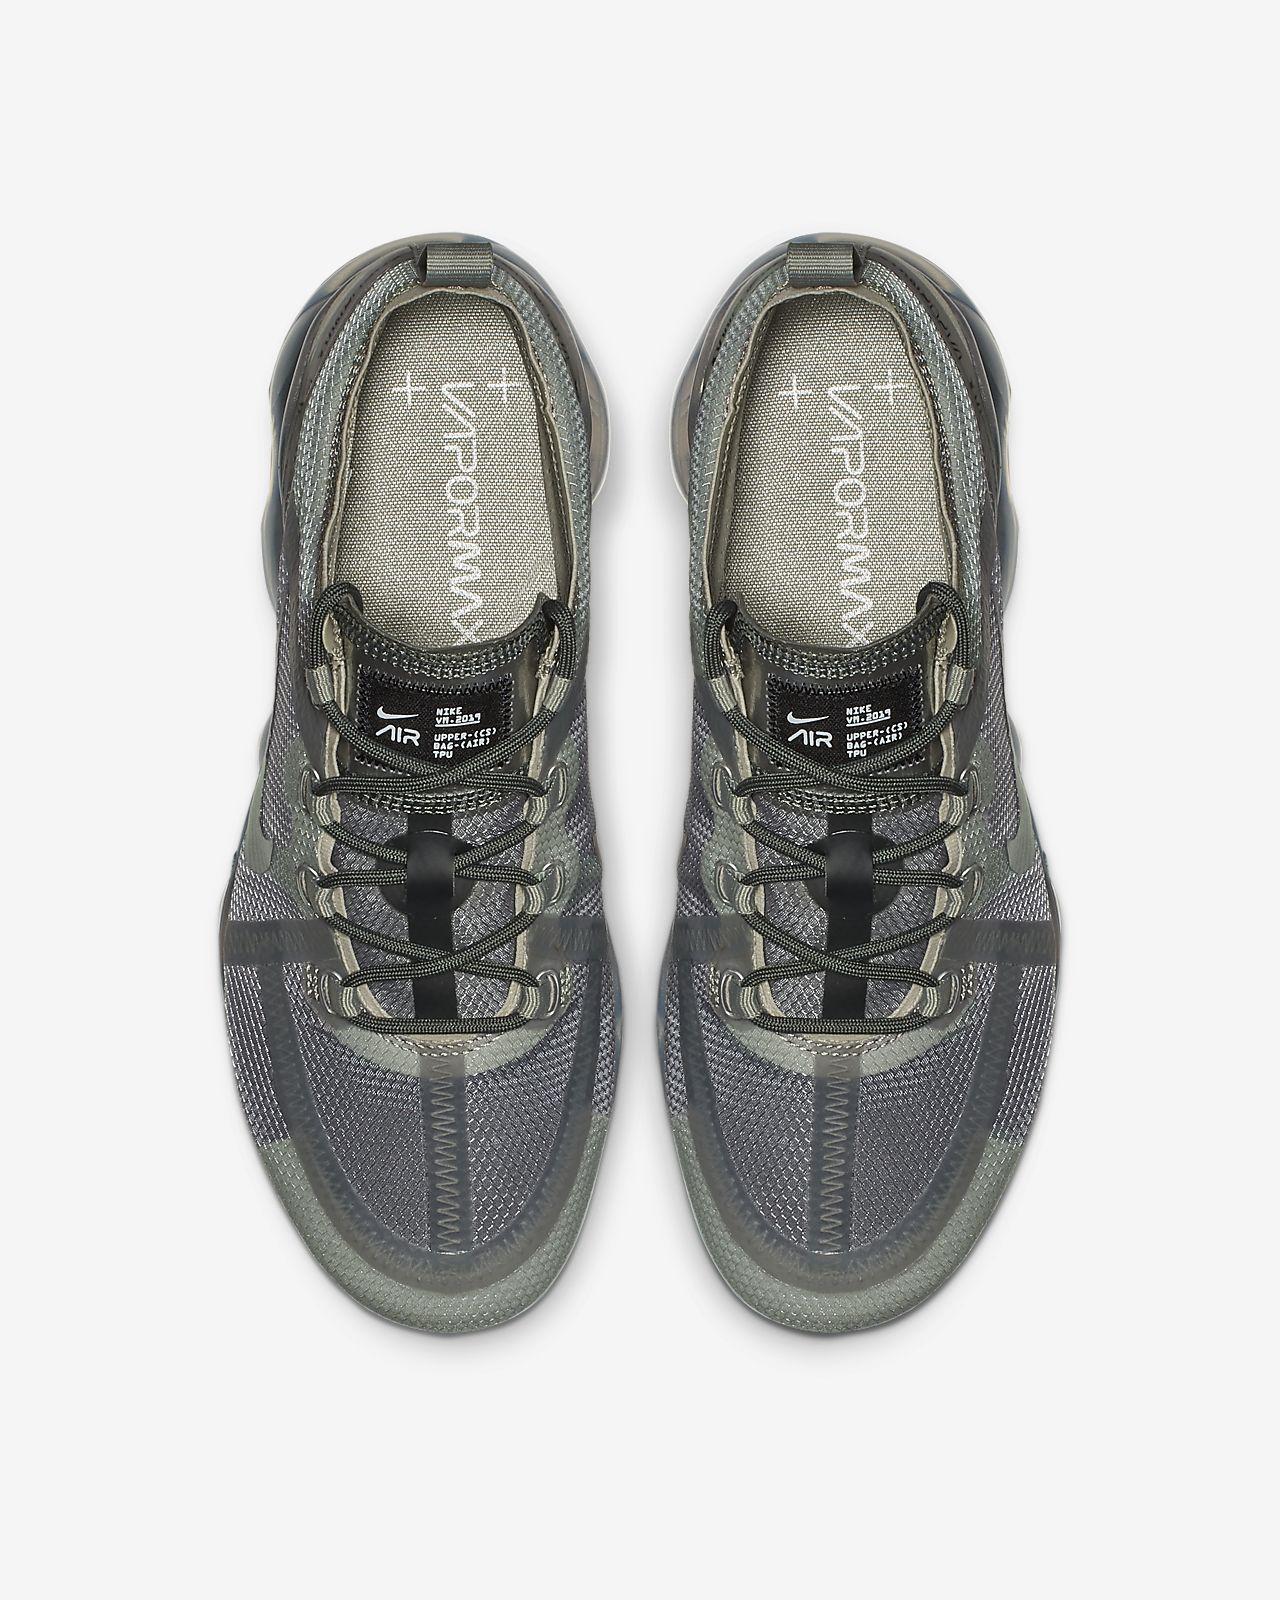 c2d0d2006c6 Nike Air VaporMax 2019 Premium Women s Shoe. Nike.com SG